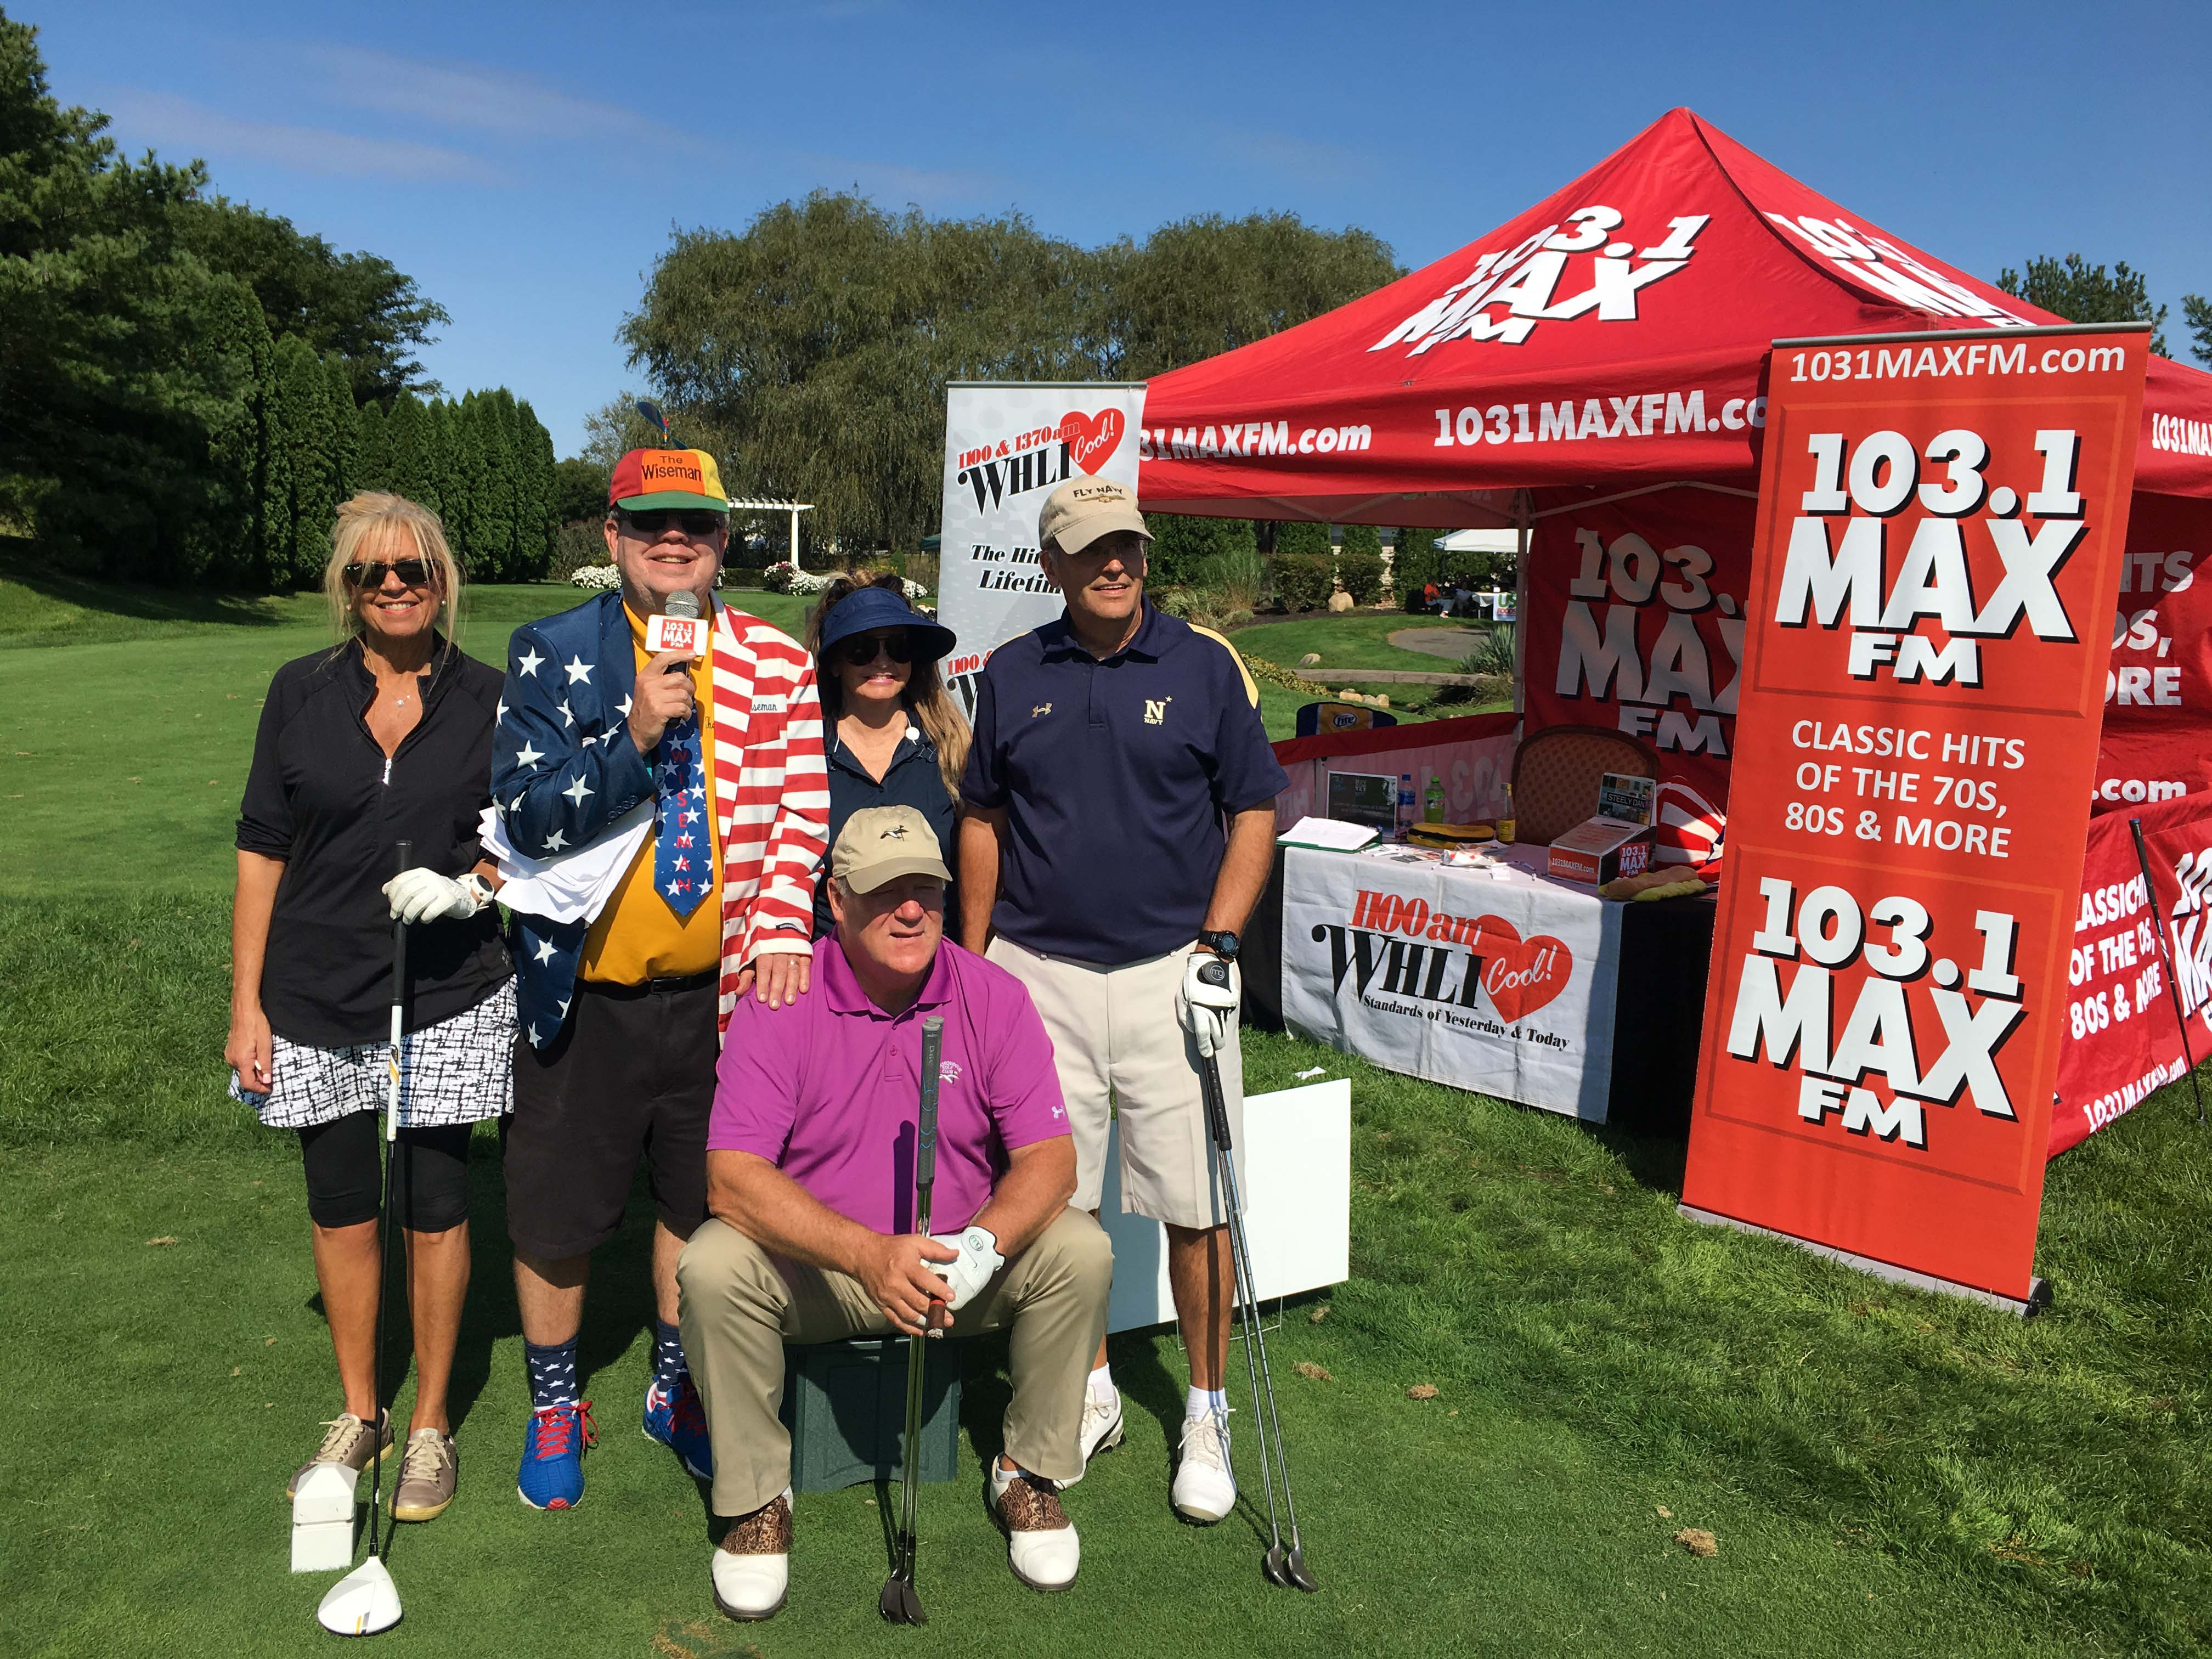 103.1 MAX FM/ 1100 WHLI Golf Outing!